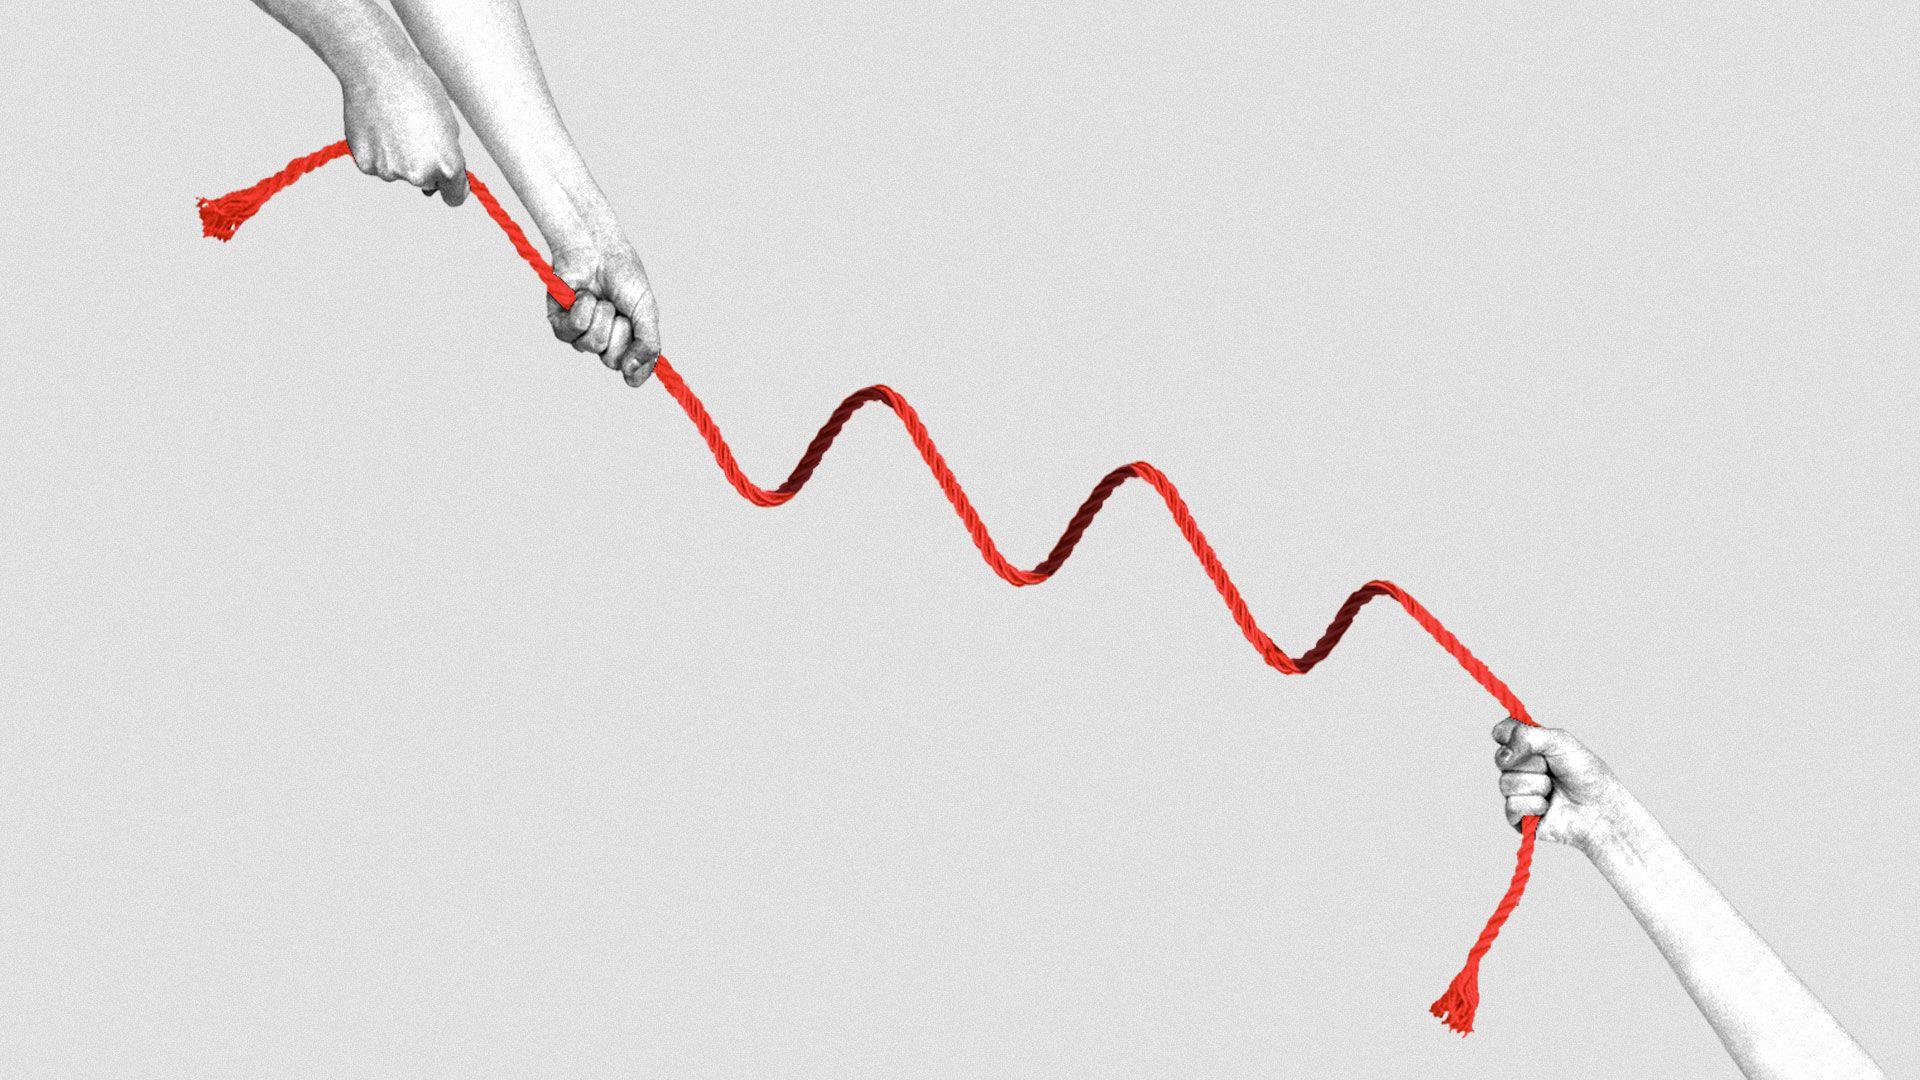 Illustration of a tug-of-war rope in the shape of a downward trending market line.